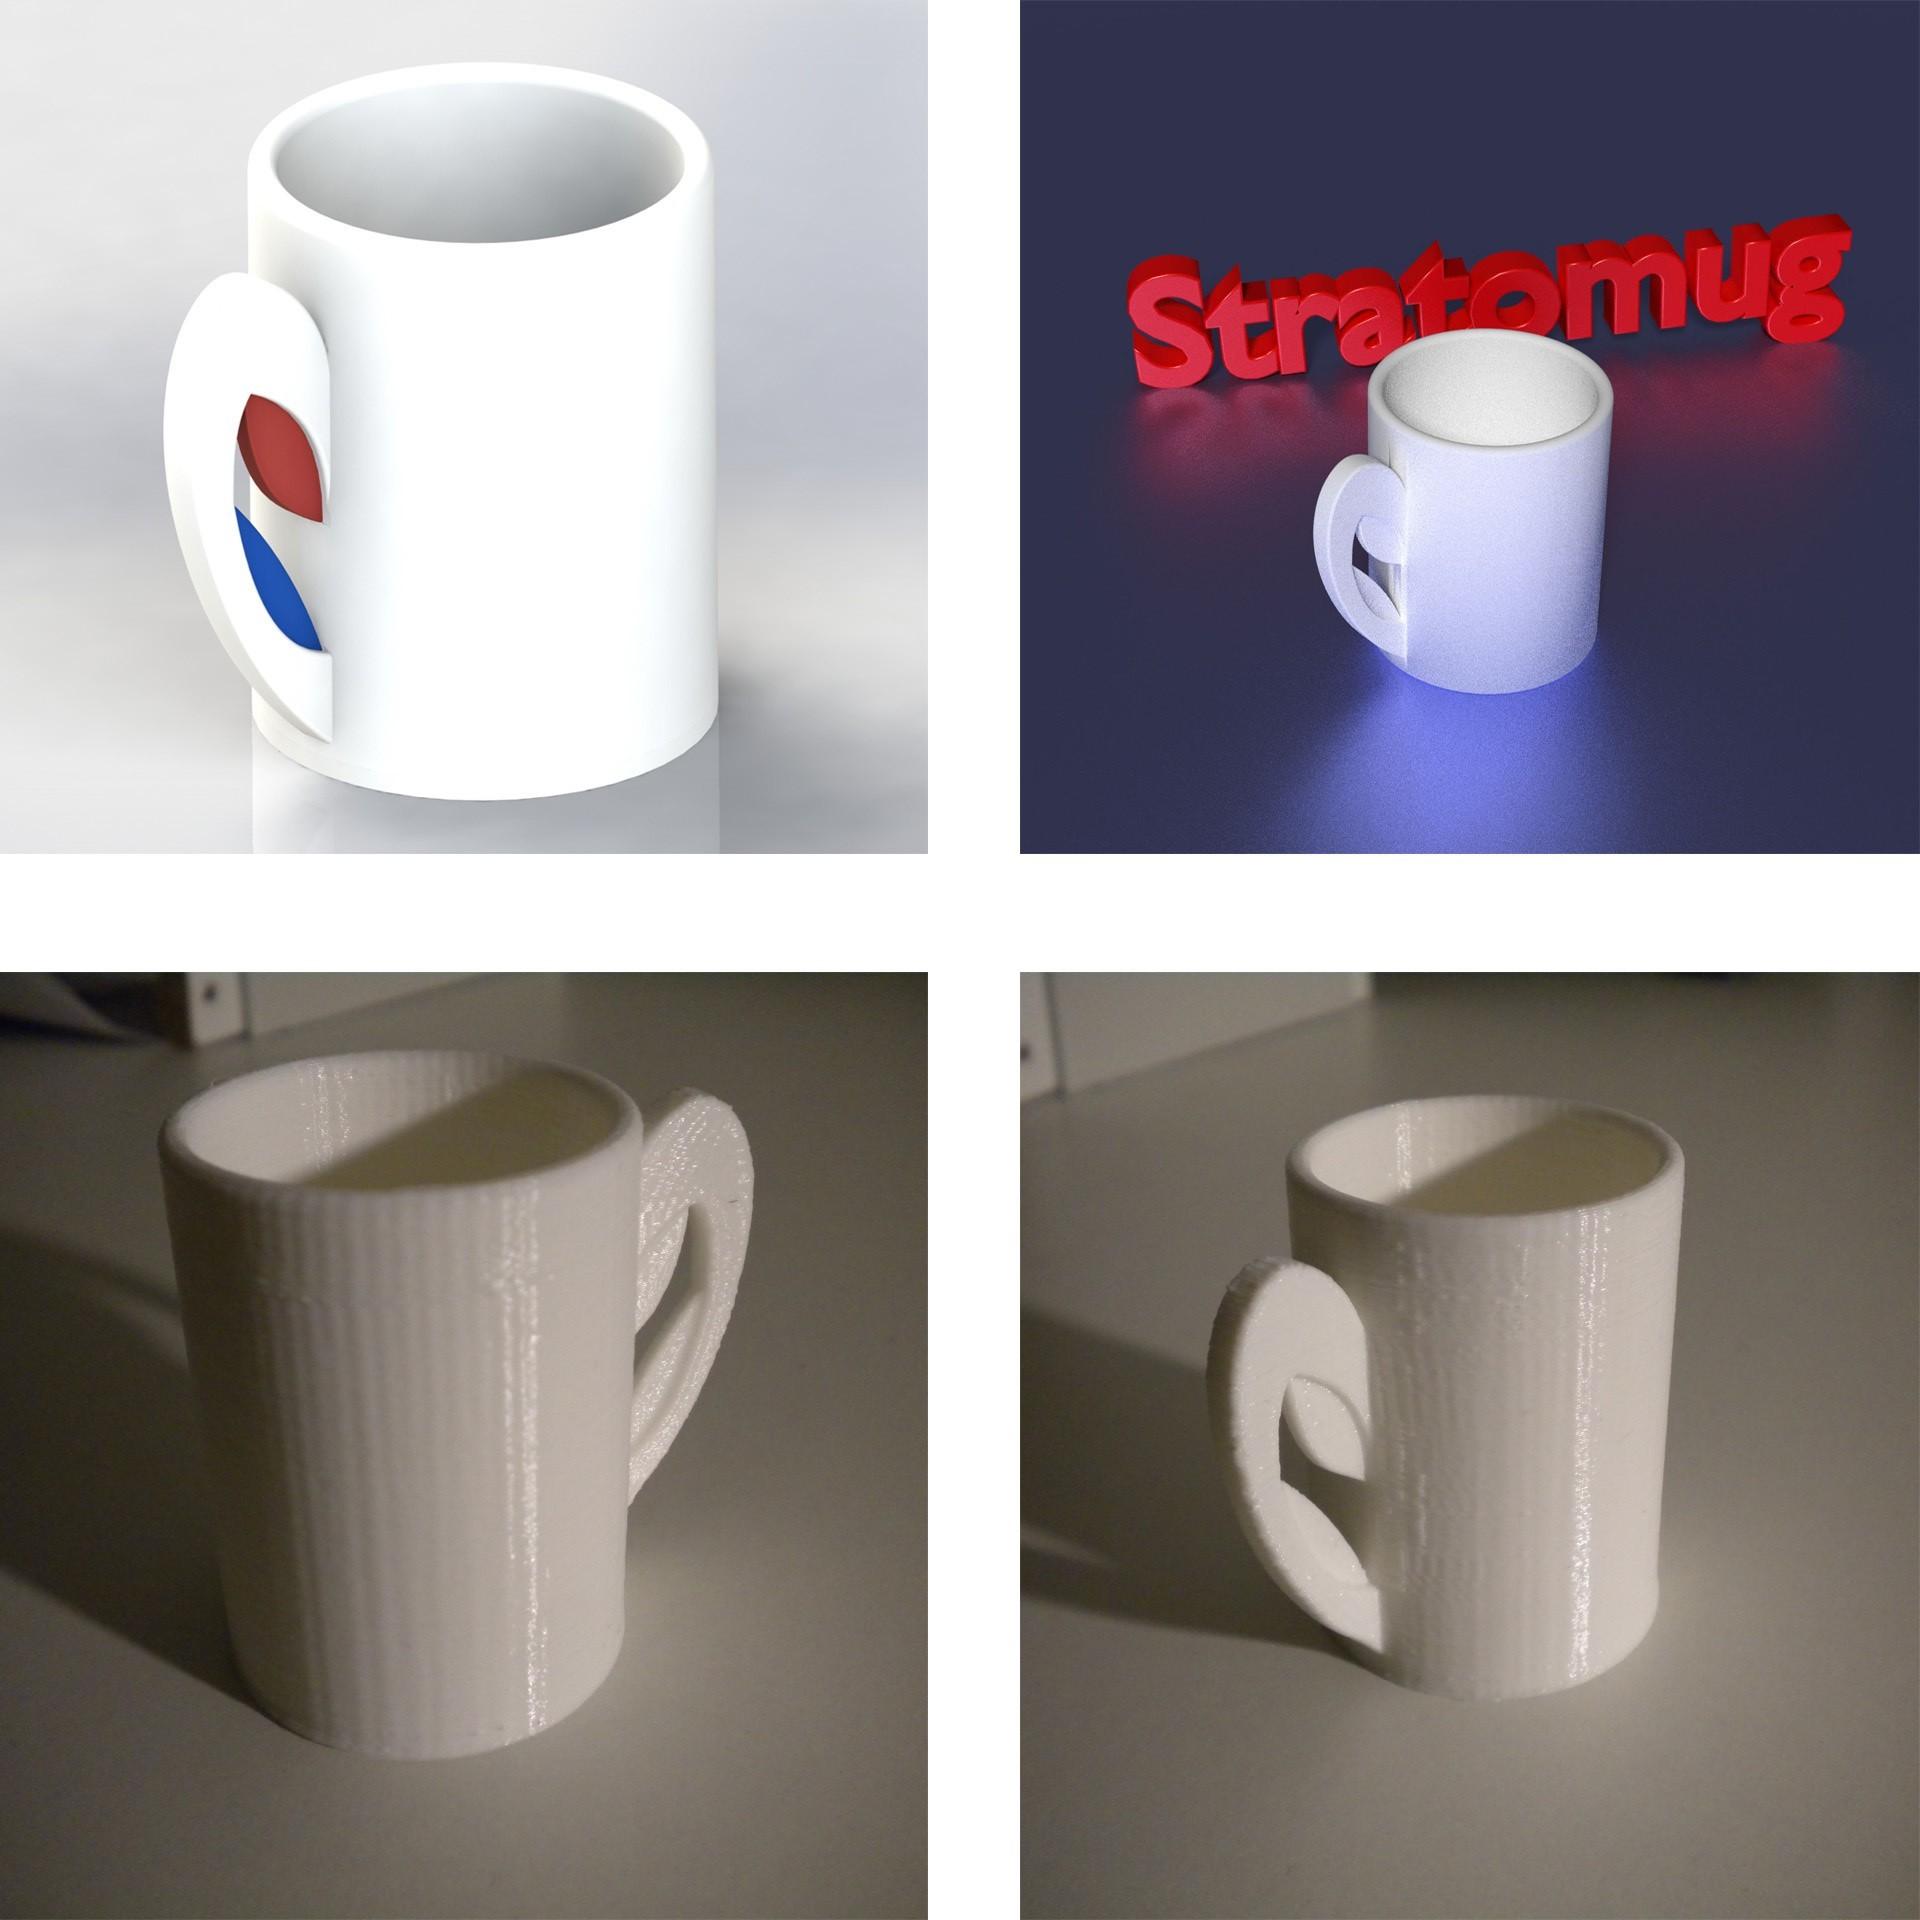 1000.jpg Download free OBJ file STRATOMAKER MUG • 3D print template, Chris48